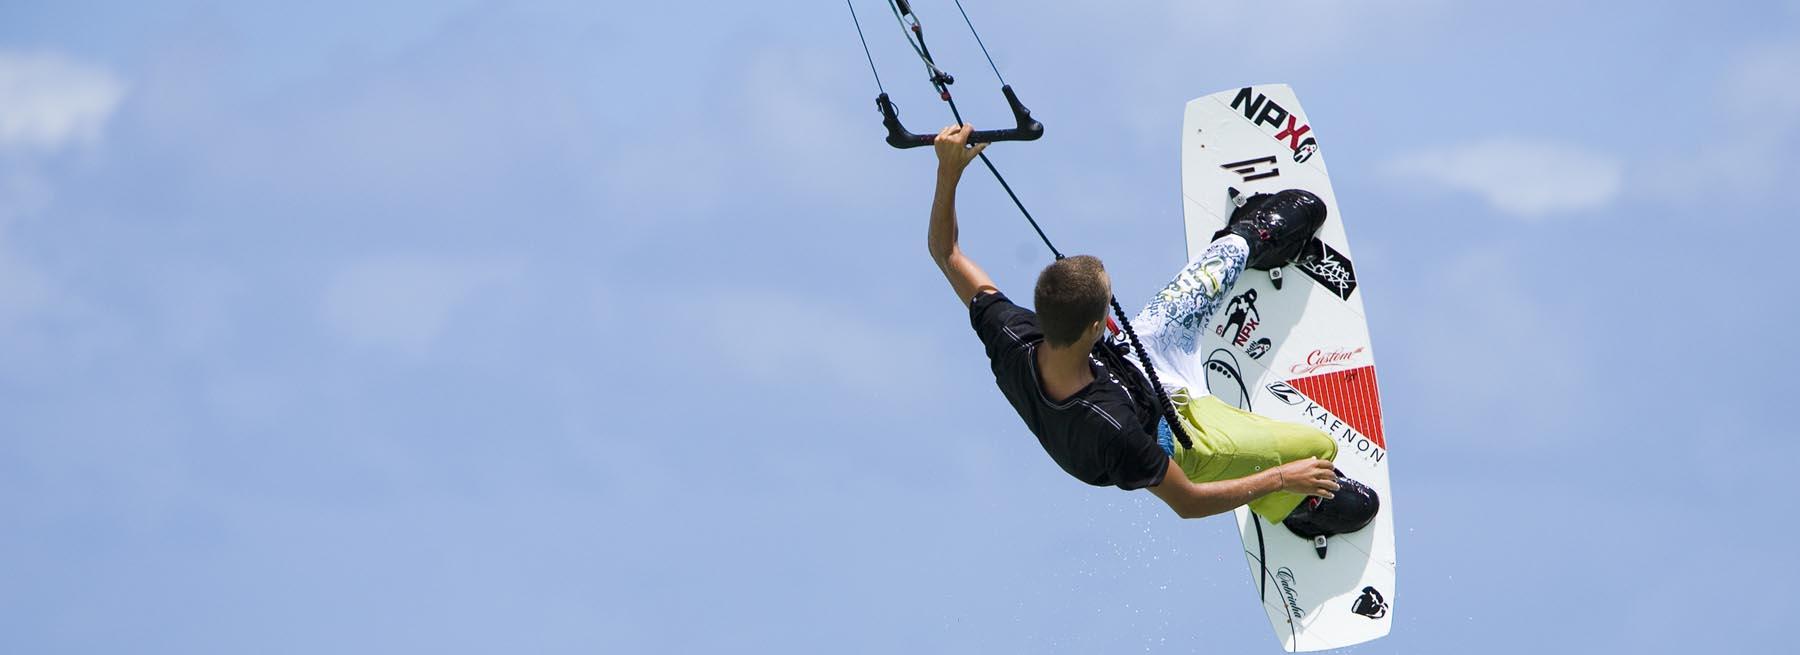 Delphina Windsurf, sun and fun at Porto Pollo  Sardinien - Italien